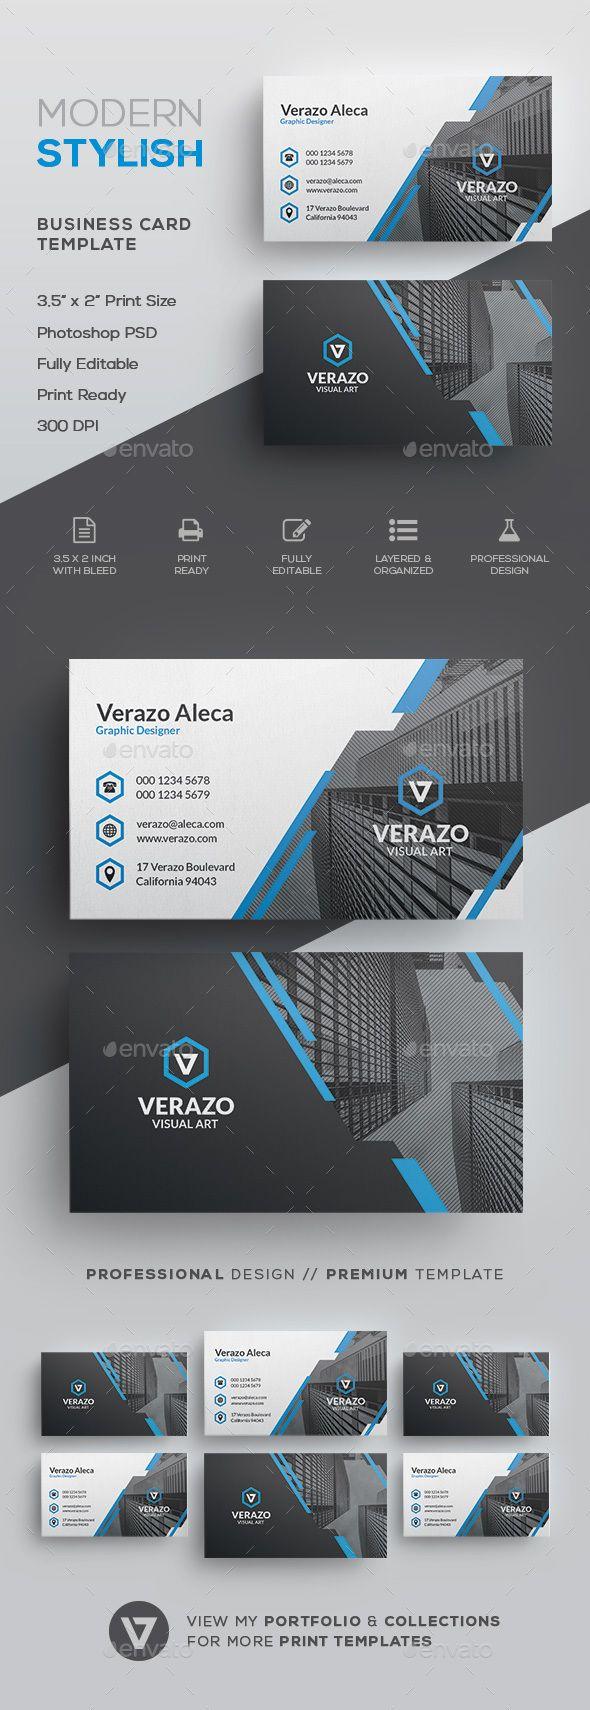 Modern Stylish Corporate Business Card Template - Corporate Business Cards(Fitness Logo Abstract)